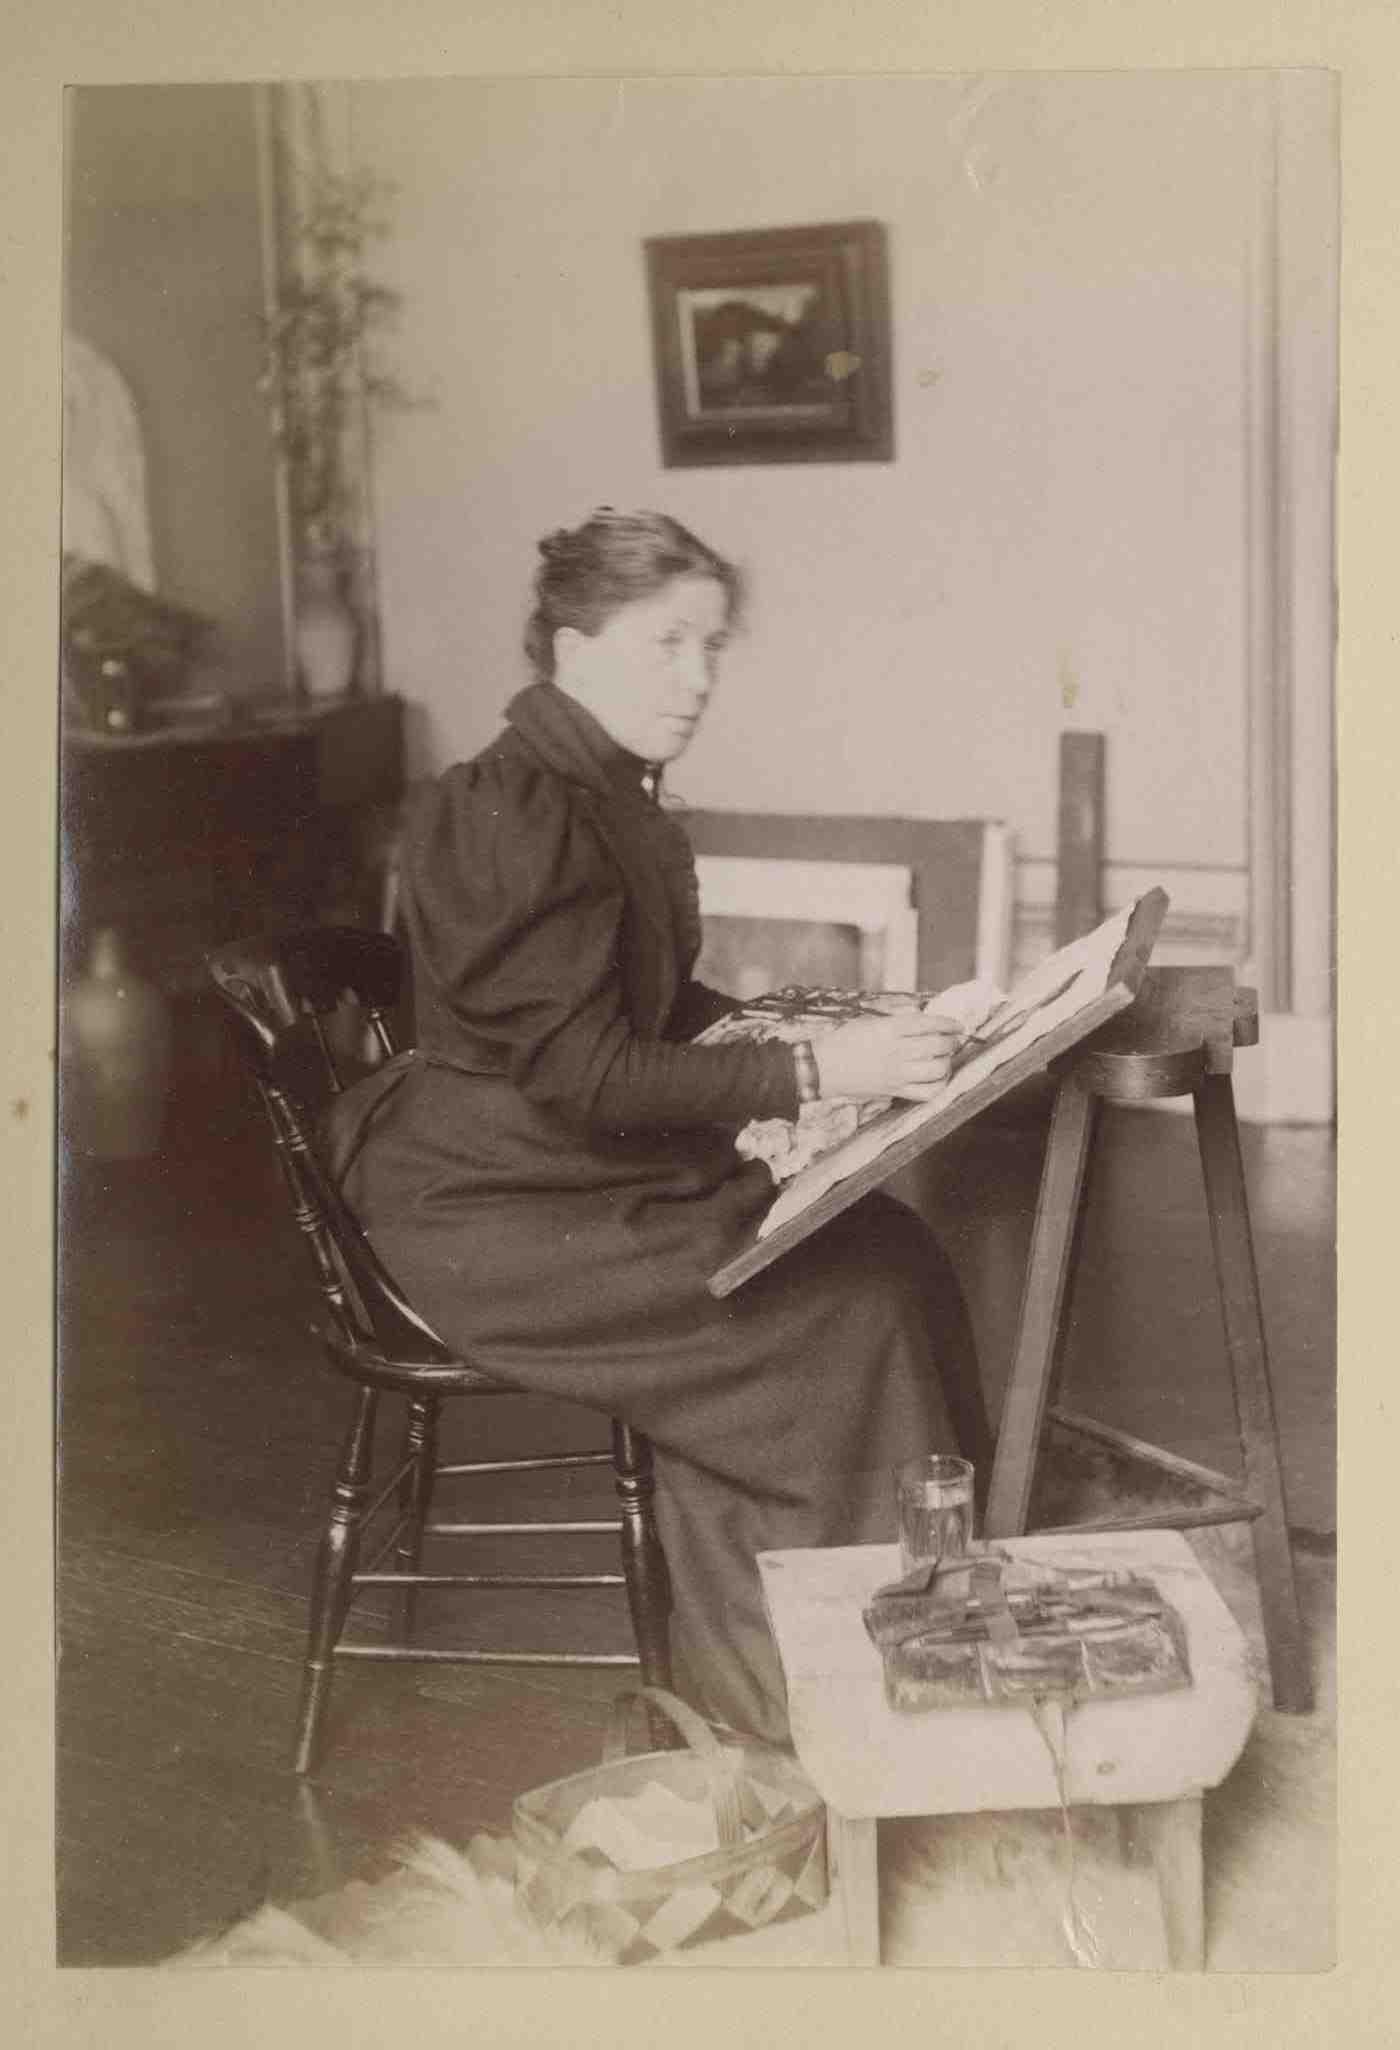 Christina Paterson Ross in her studio?